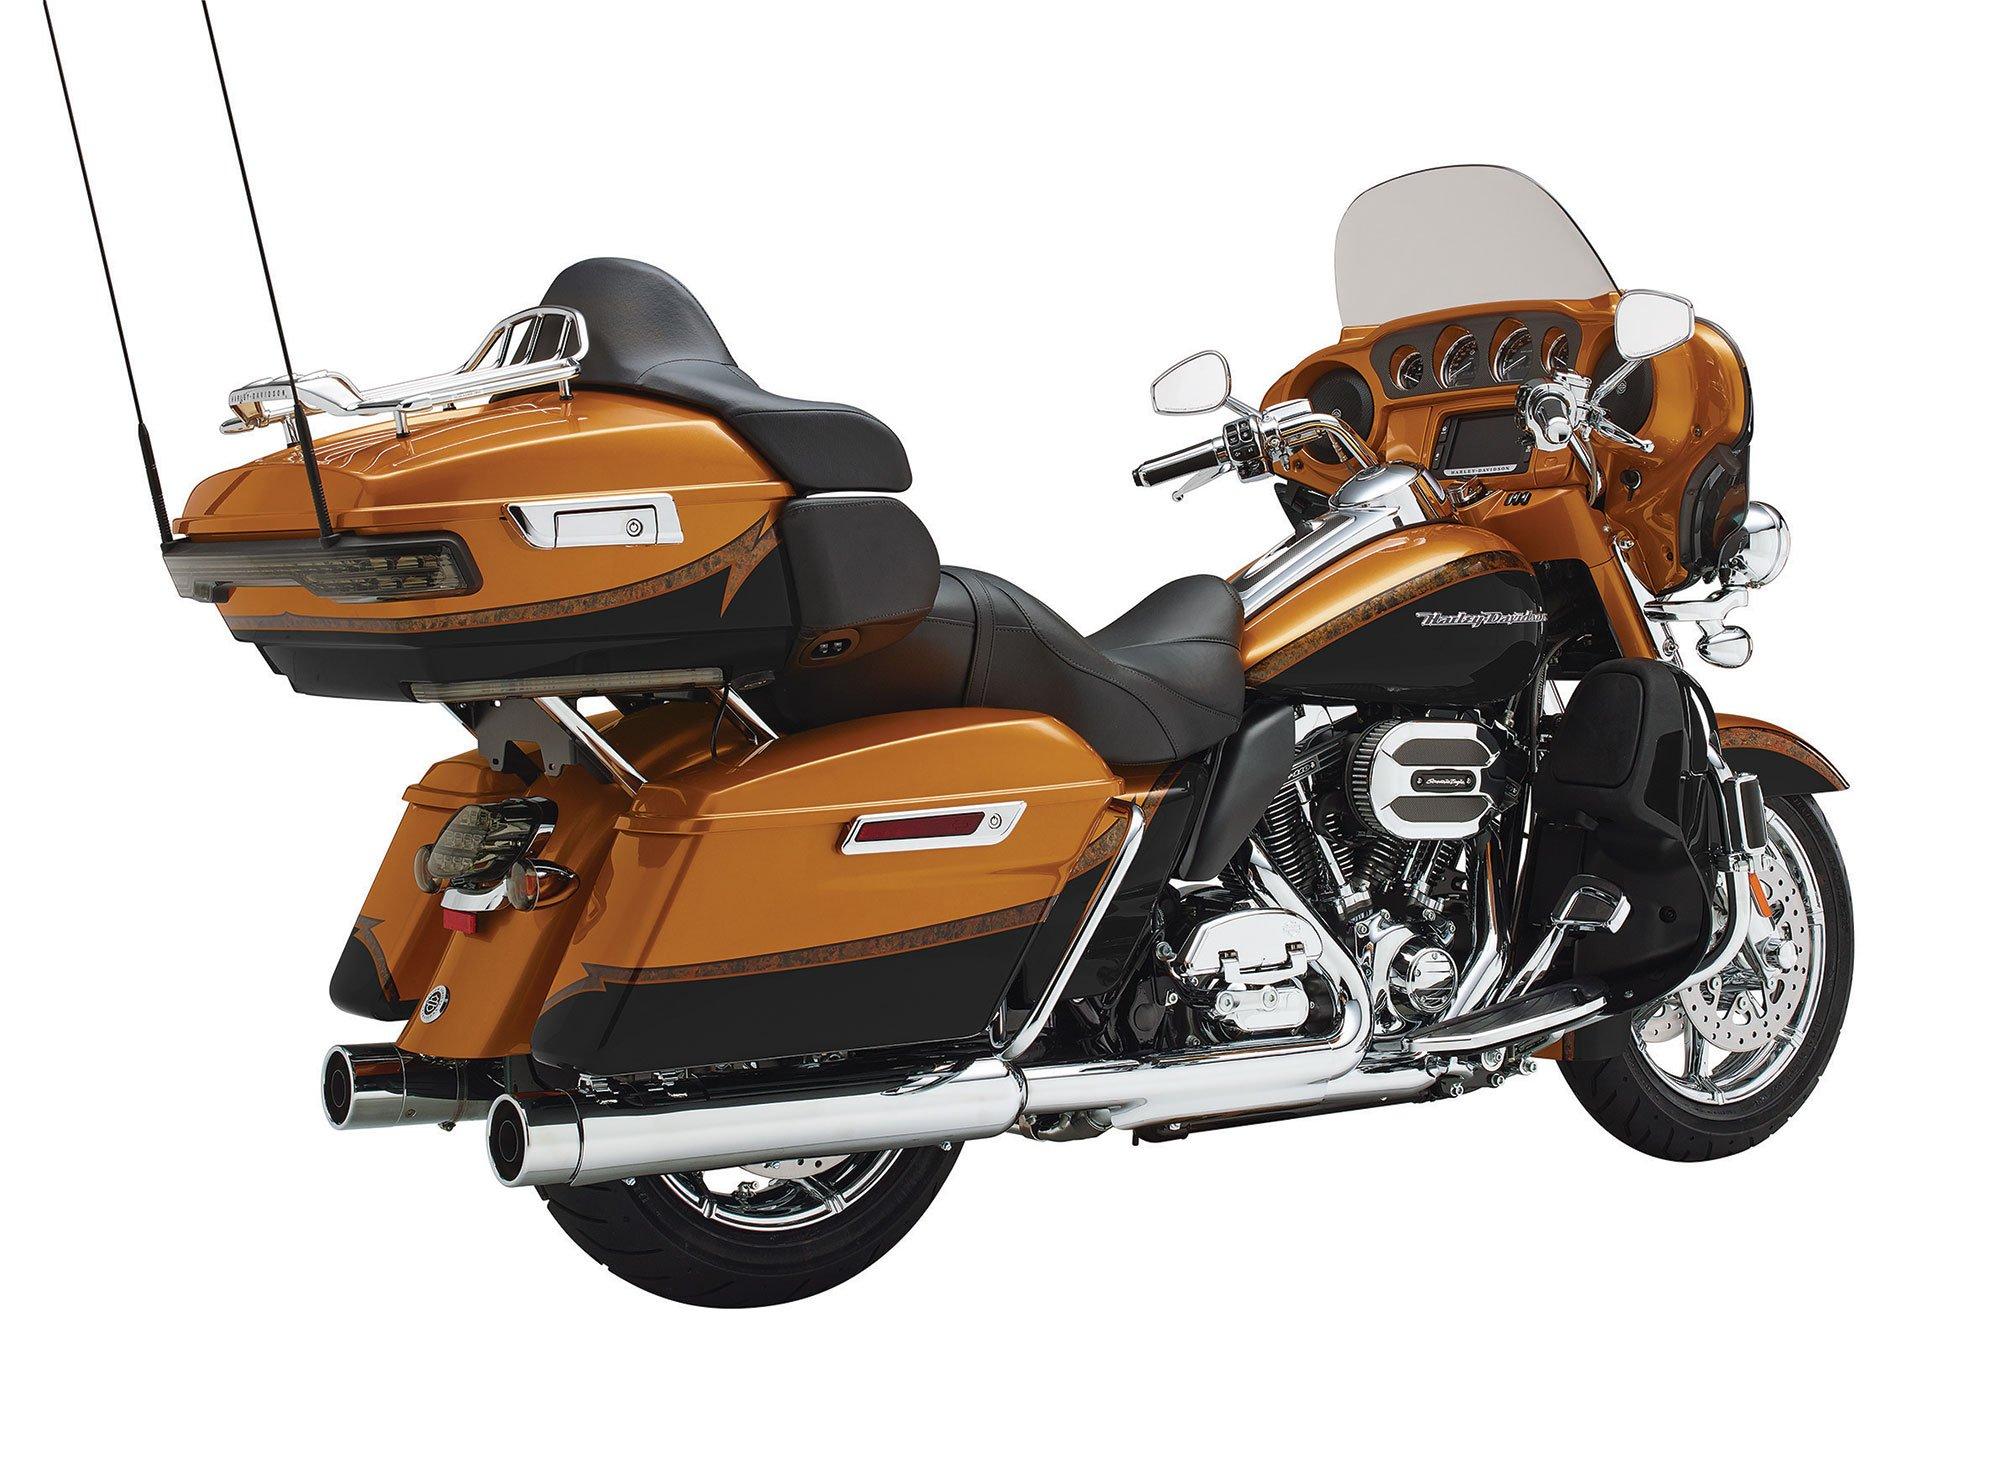 2015 Harley Davidson FLHTKSE CVO Limited E Wallpaper